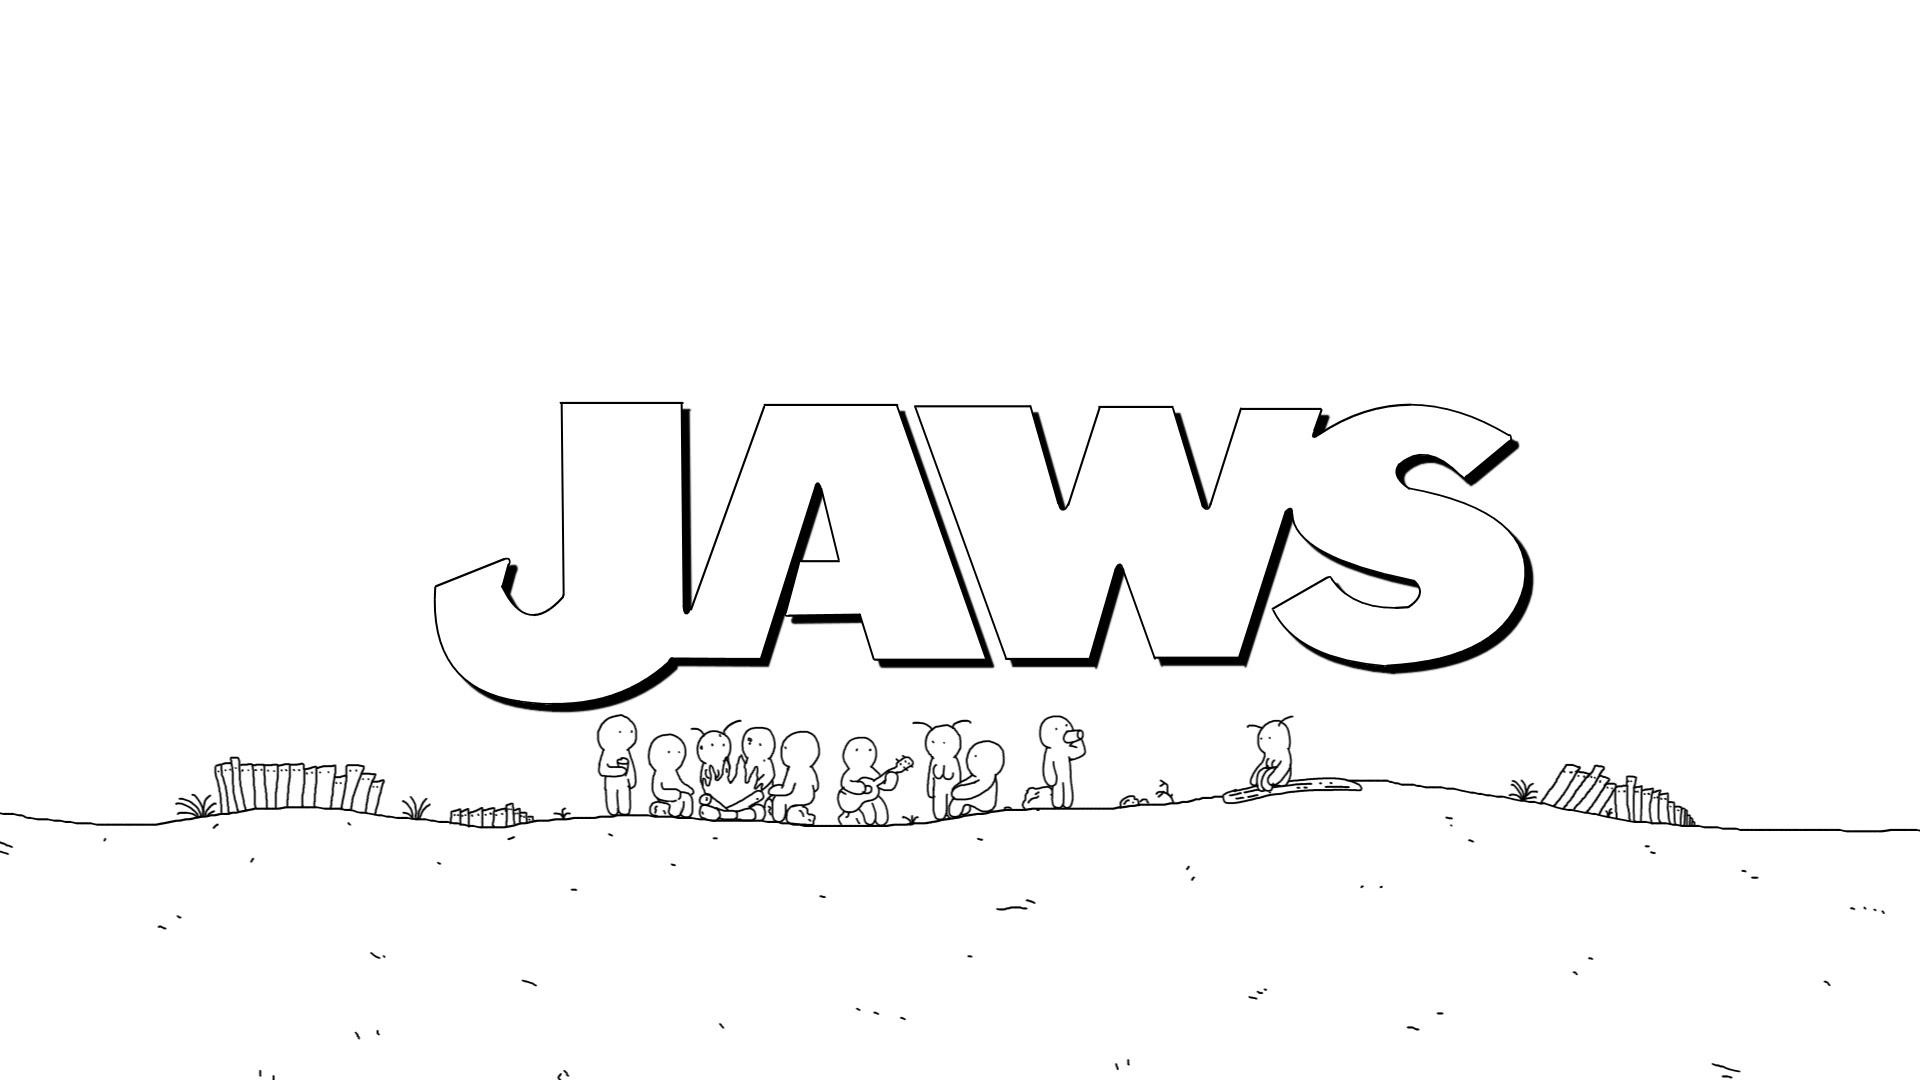 Steven Spielberg's 1975 Thriller Film 'Jaws' Condensed Into a One-Minute Animated Speedrun